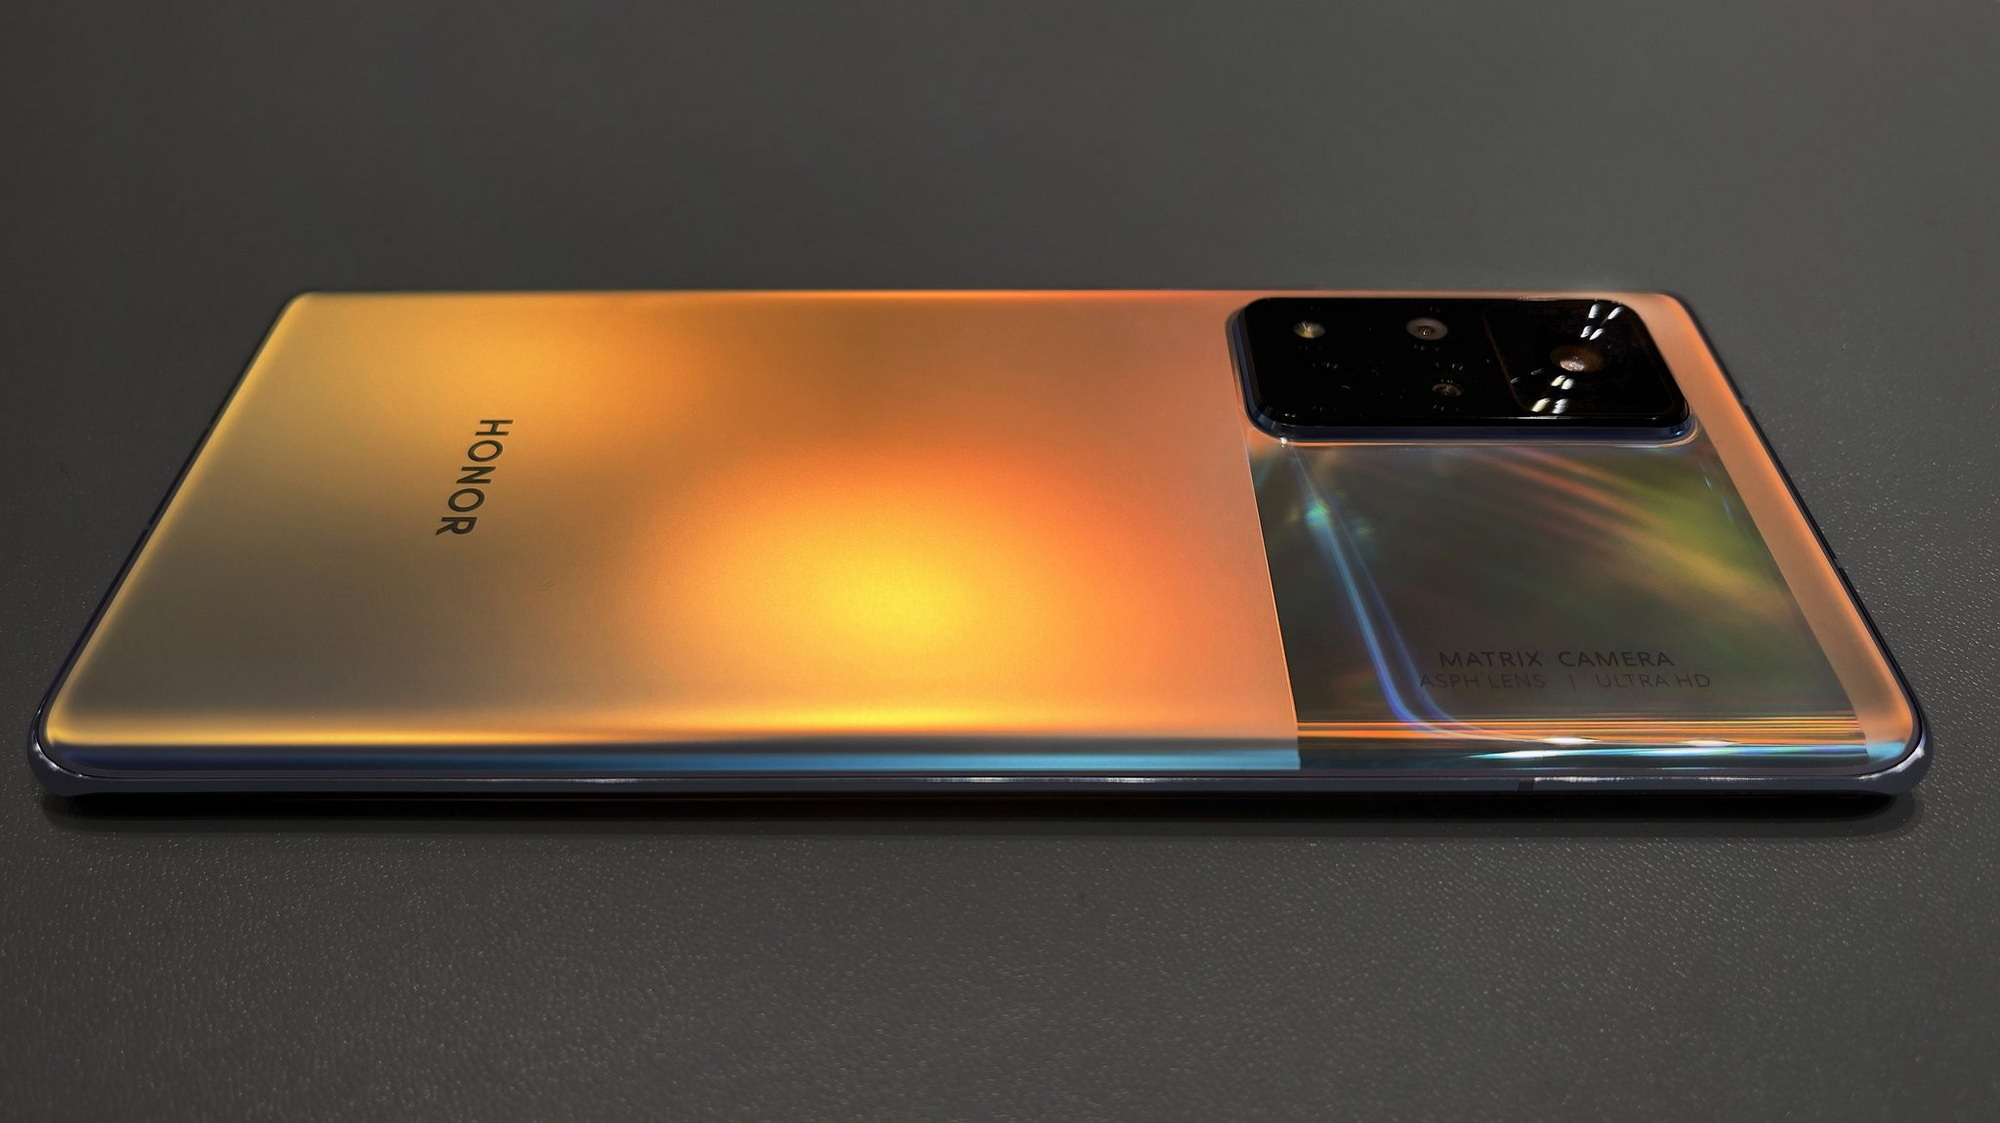 Honor V40 и Huawei Mate 40 Pro показался на видео Другие устройства  - ptenec_vyletel_iz_gnezda_honor_v40_radom_s_huawei_mate_40_pro_na_foto_picture2_0